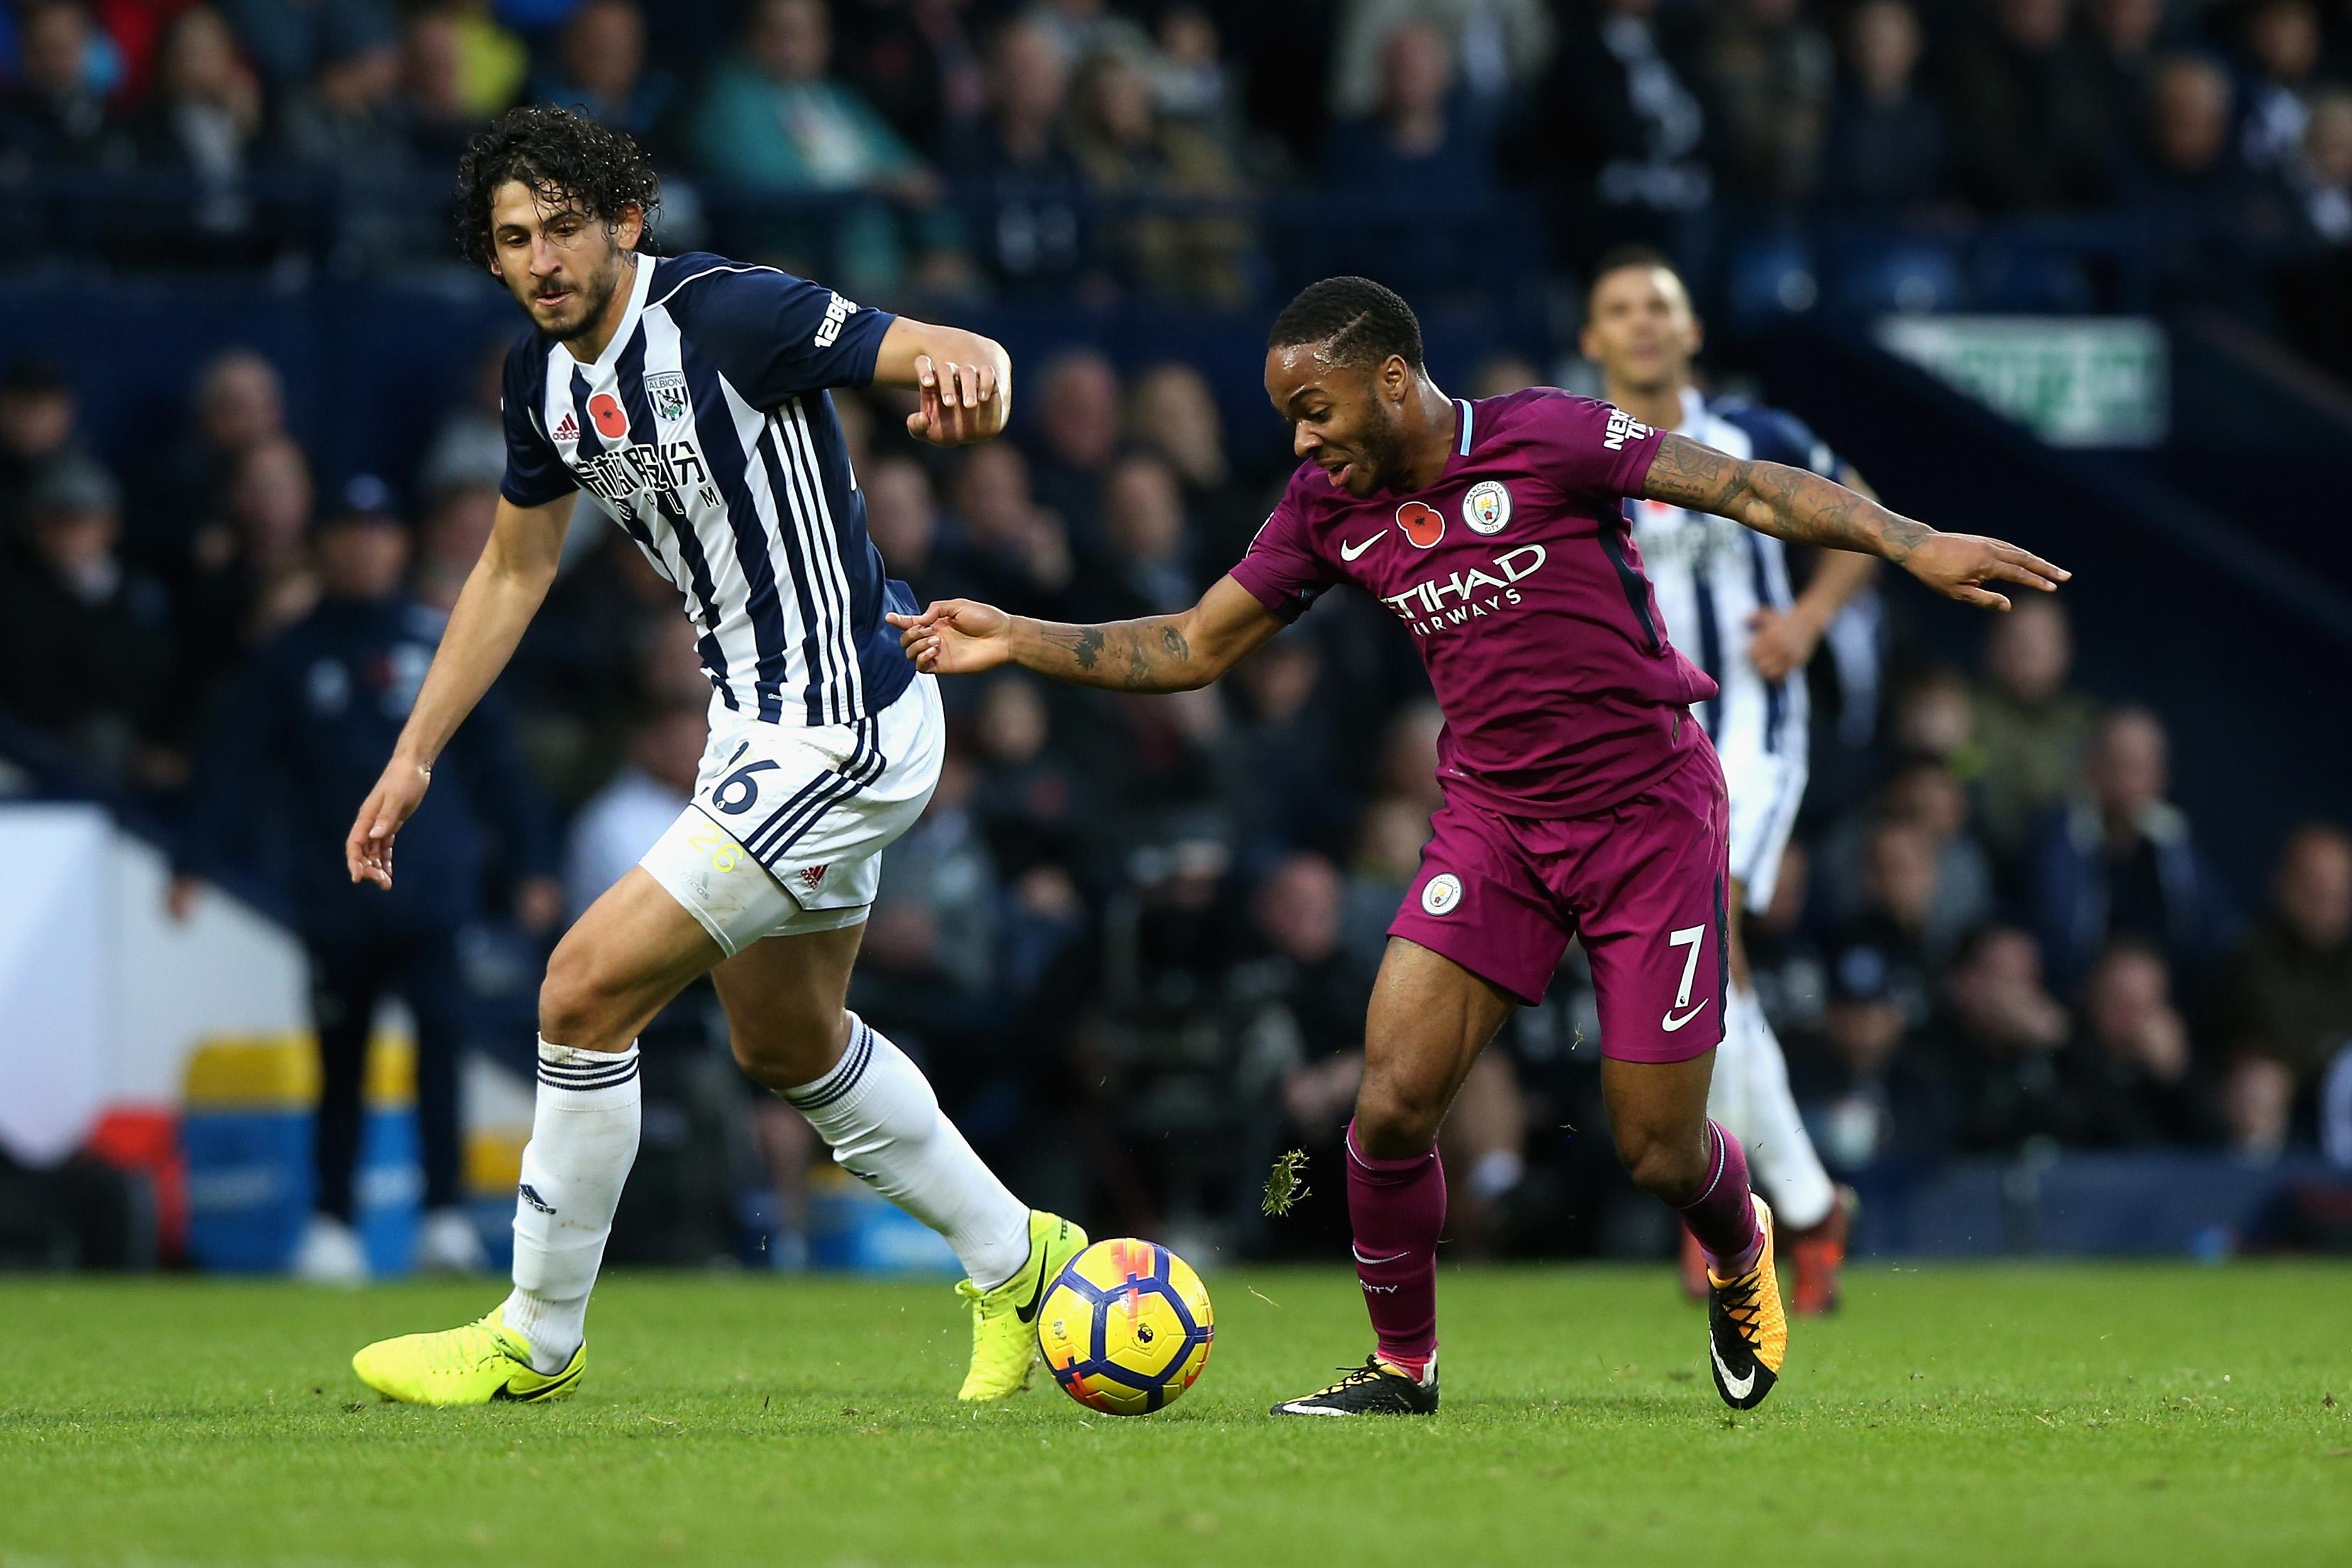 Mourinho already planning to catch City next season